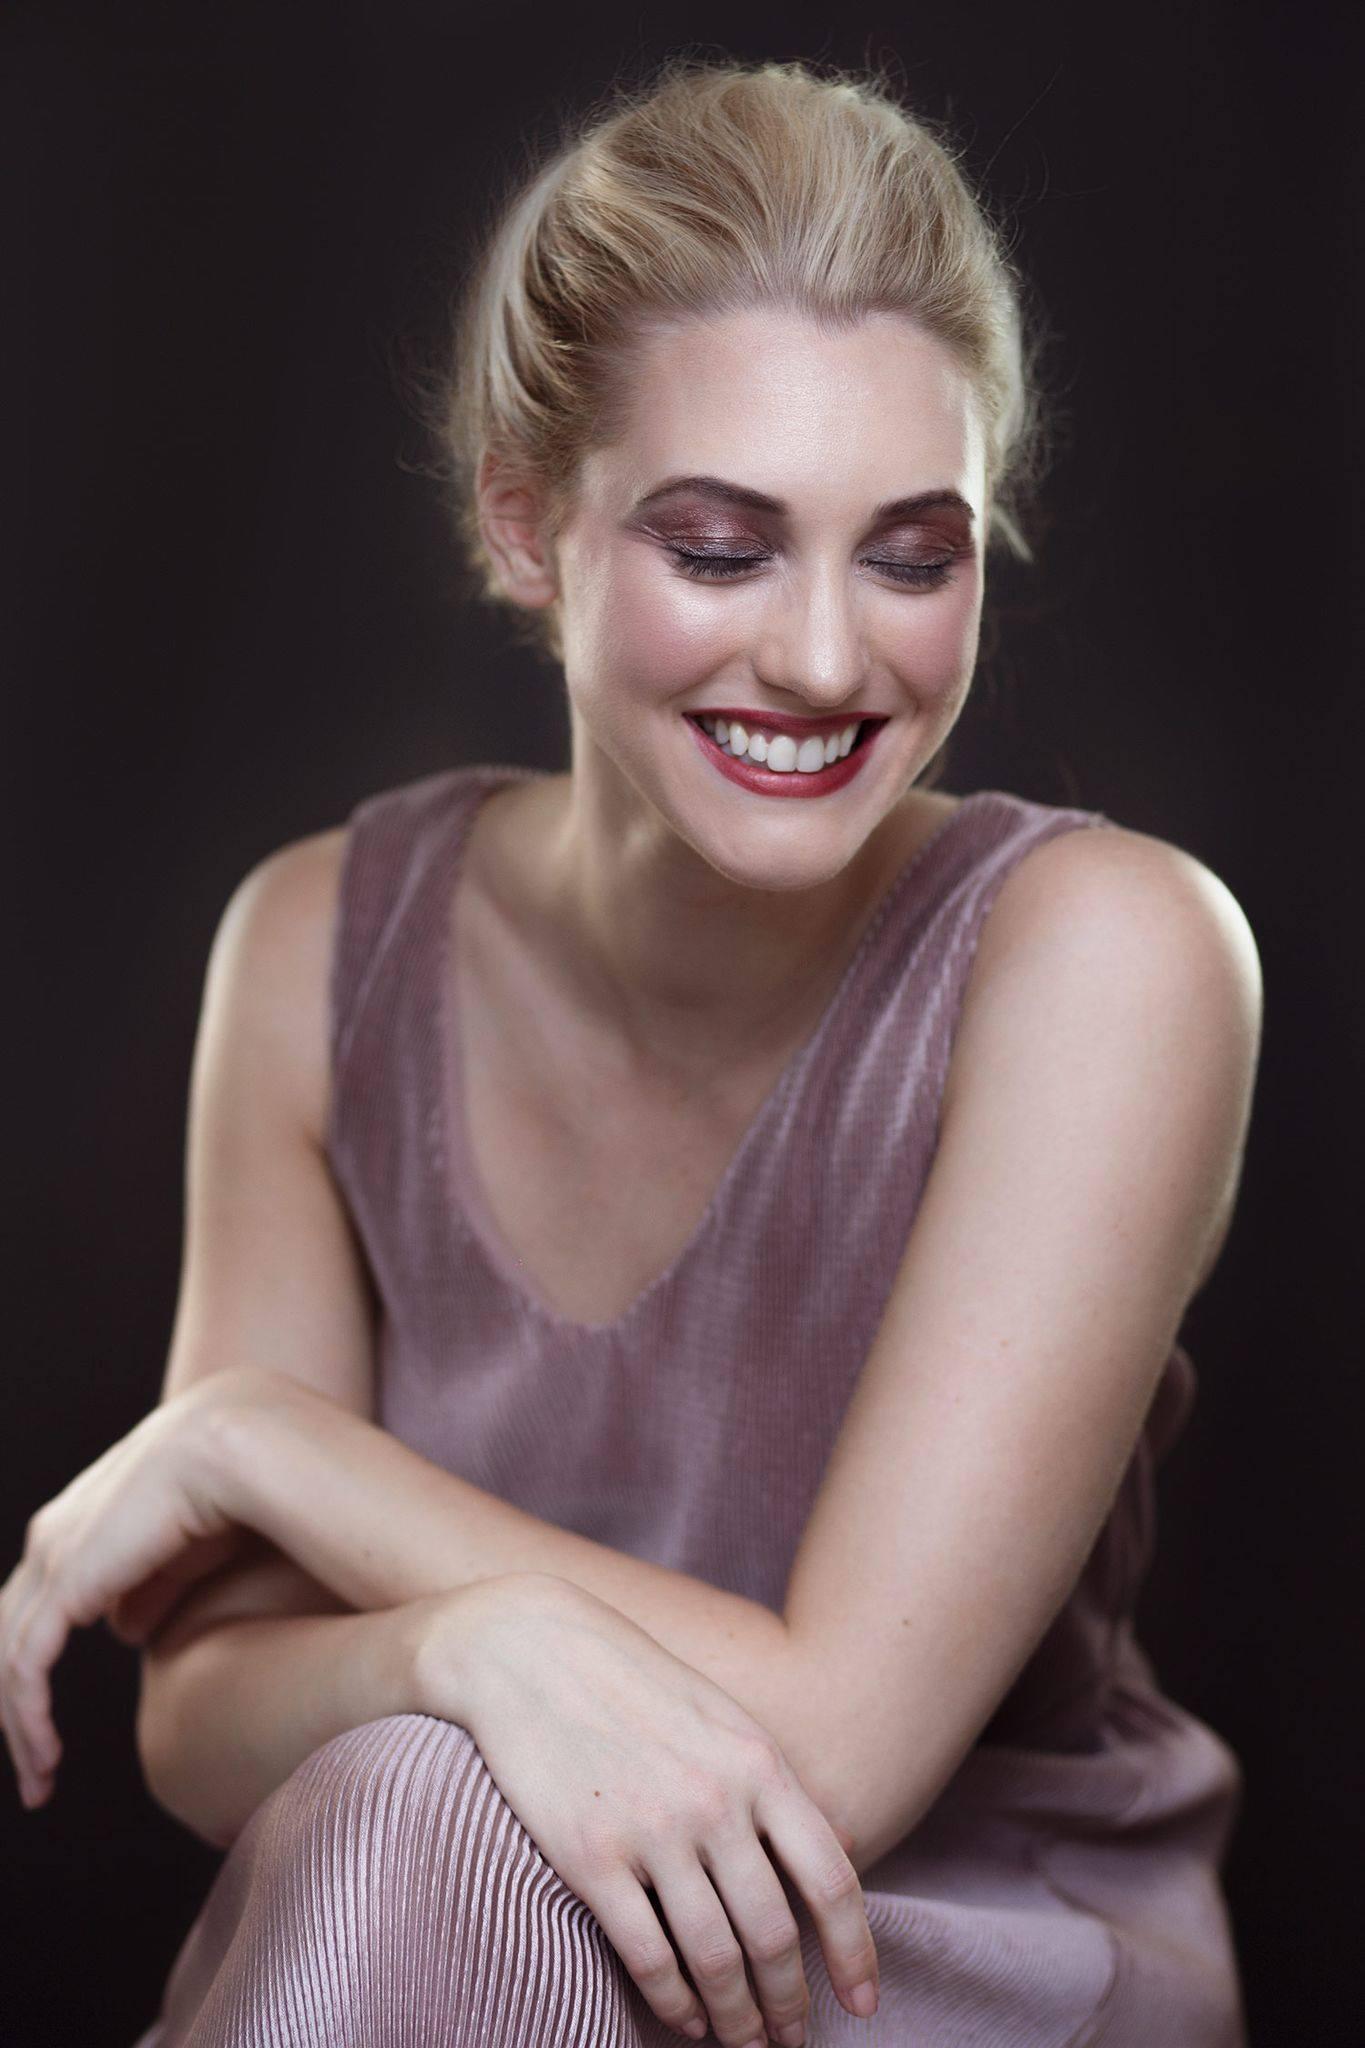 portrait-photography-woman-sissela